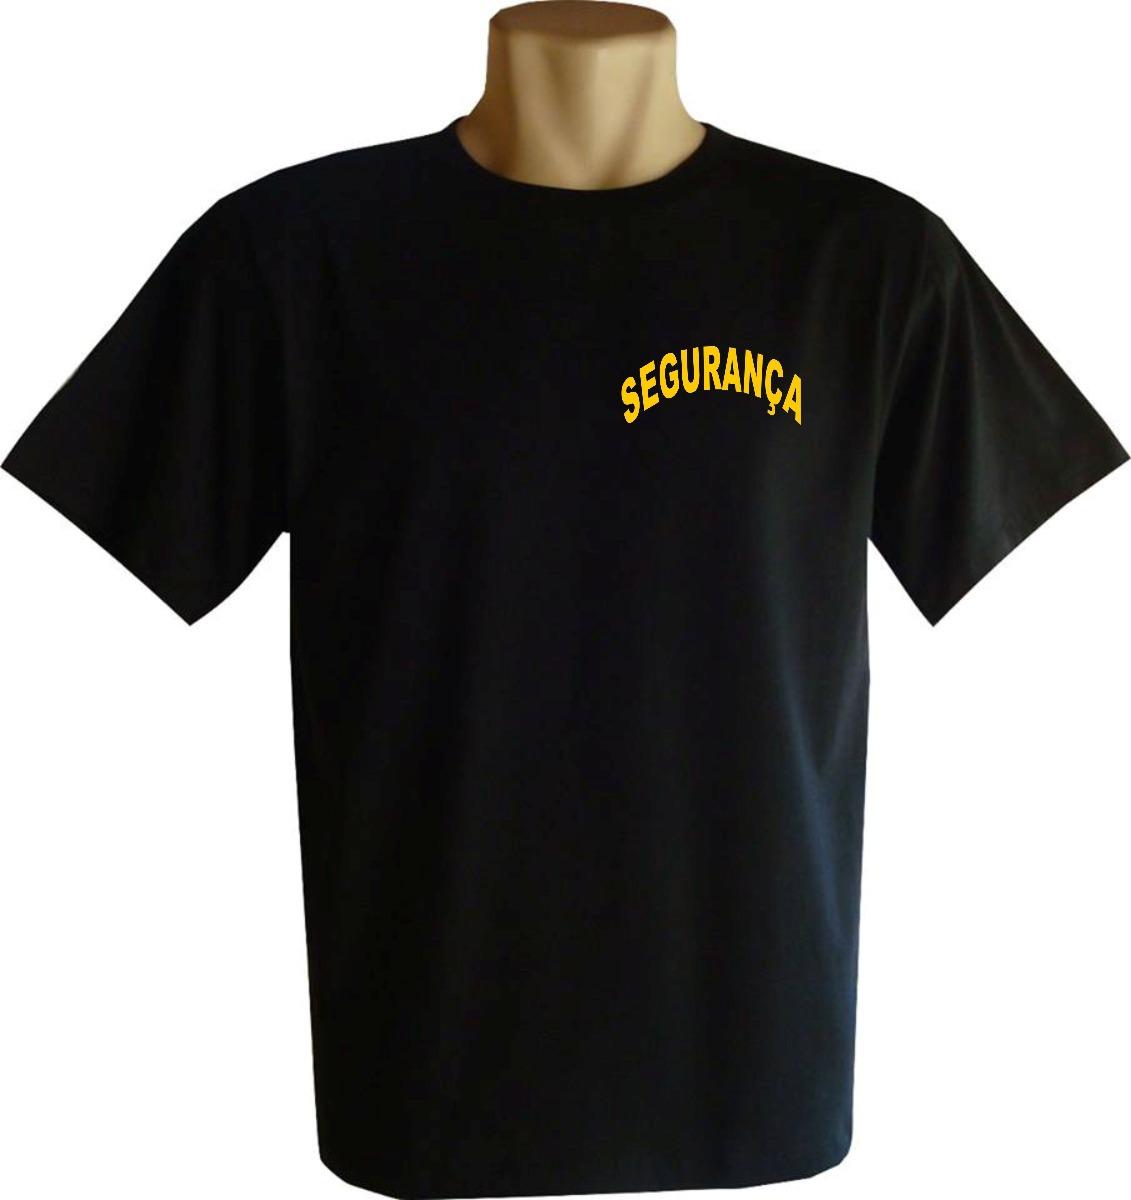 401c64af15 camisa segurança camiseta malha pv malha fria. Carregando zoom.